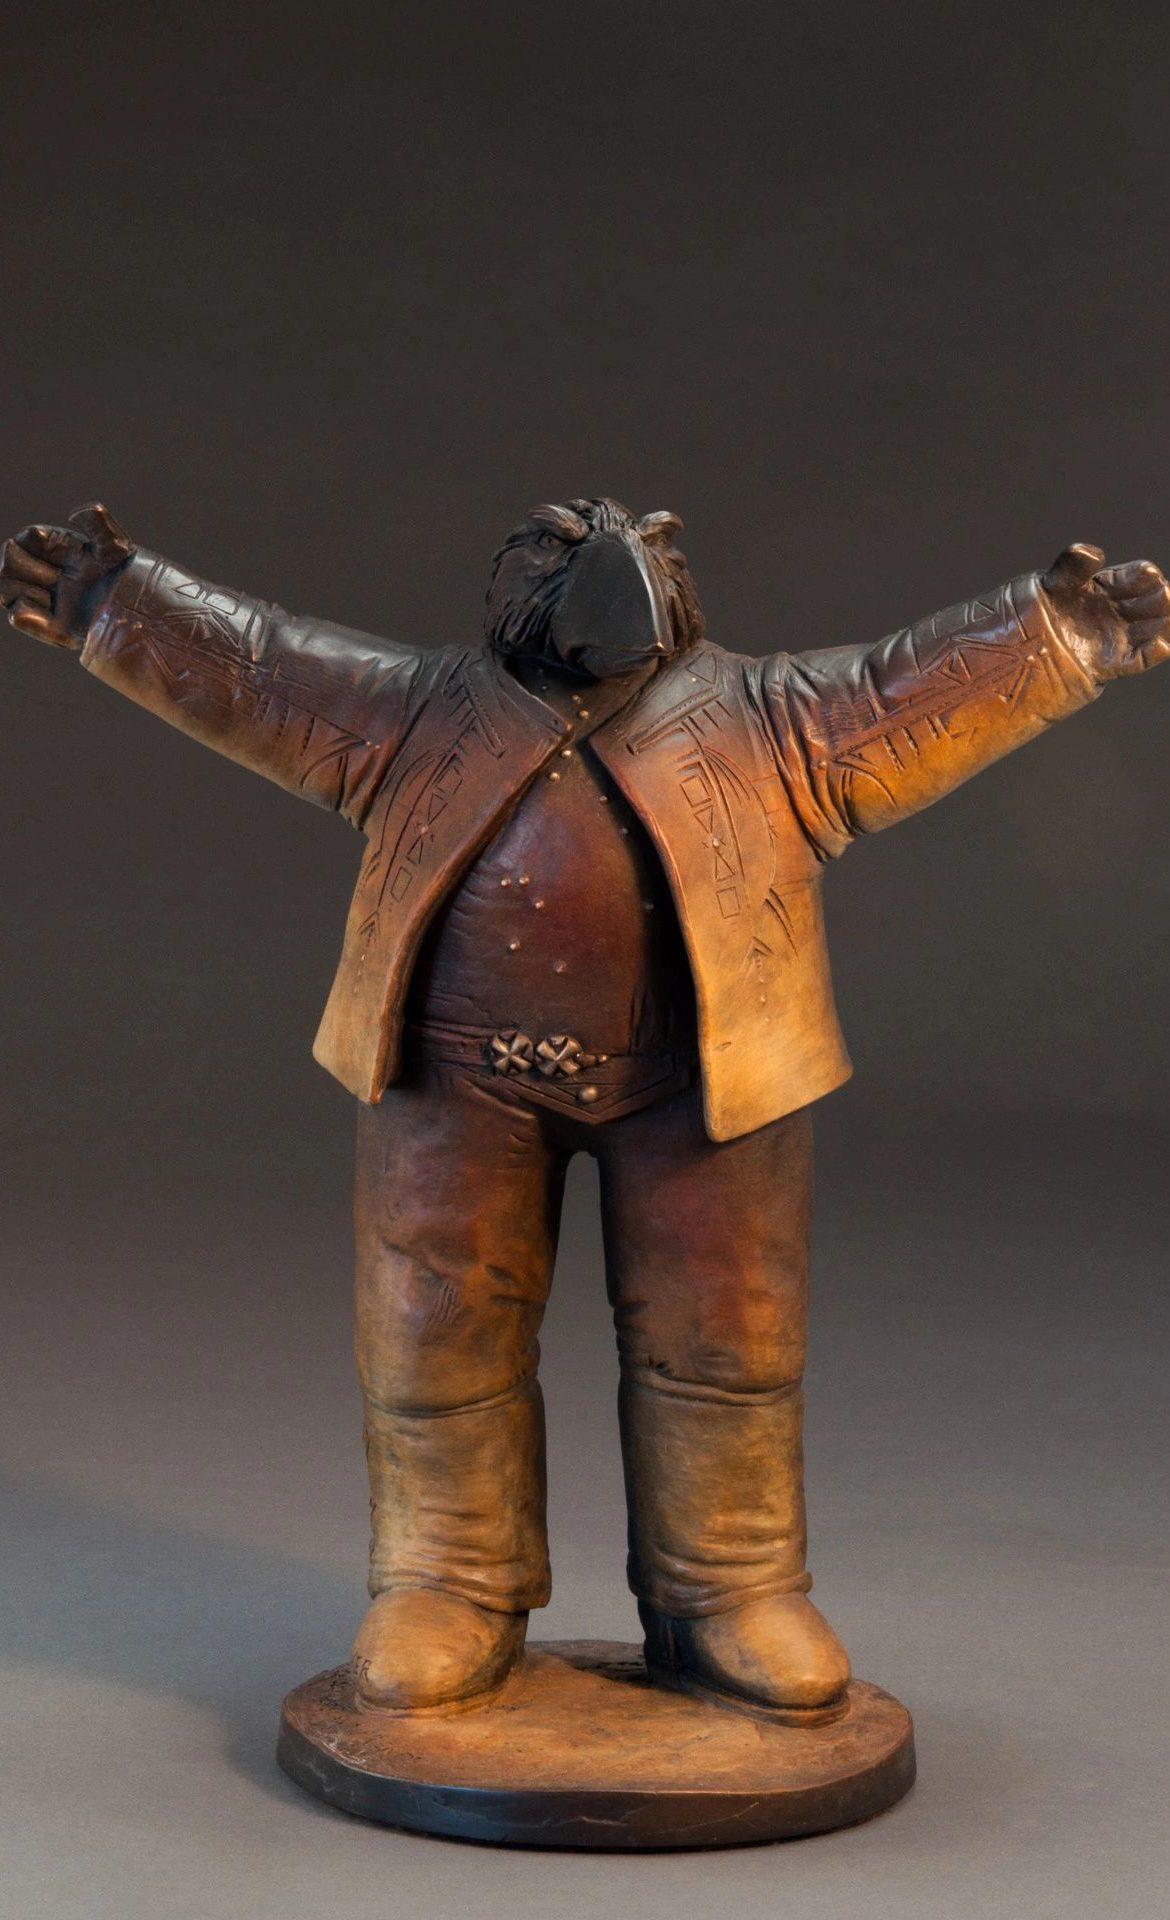 Stories of Survivors and Friends, Brubaker, Bronze Sculpture, Rogoway Gallery